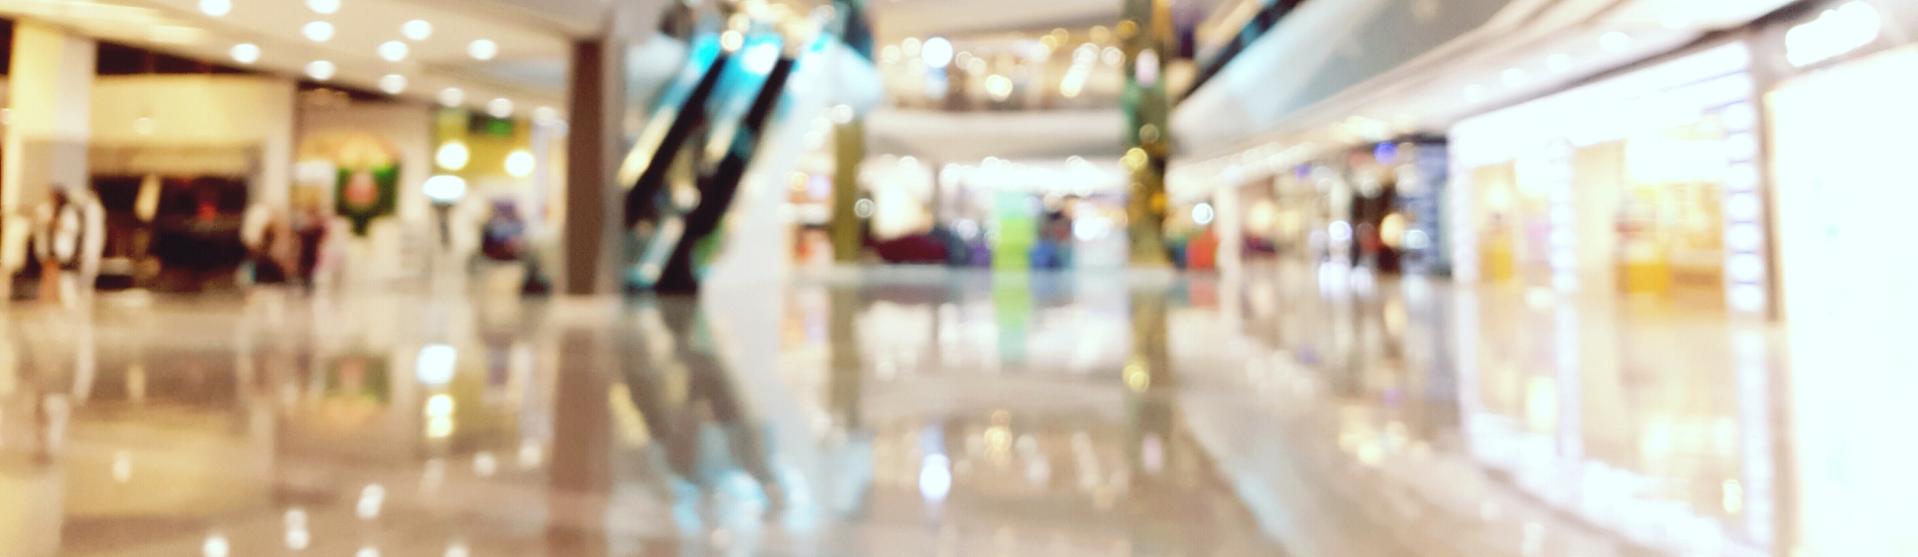 General hallway photo